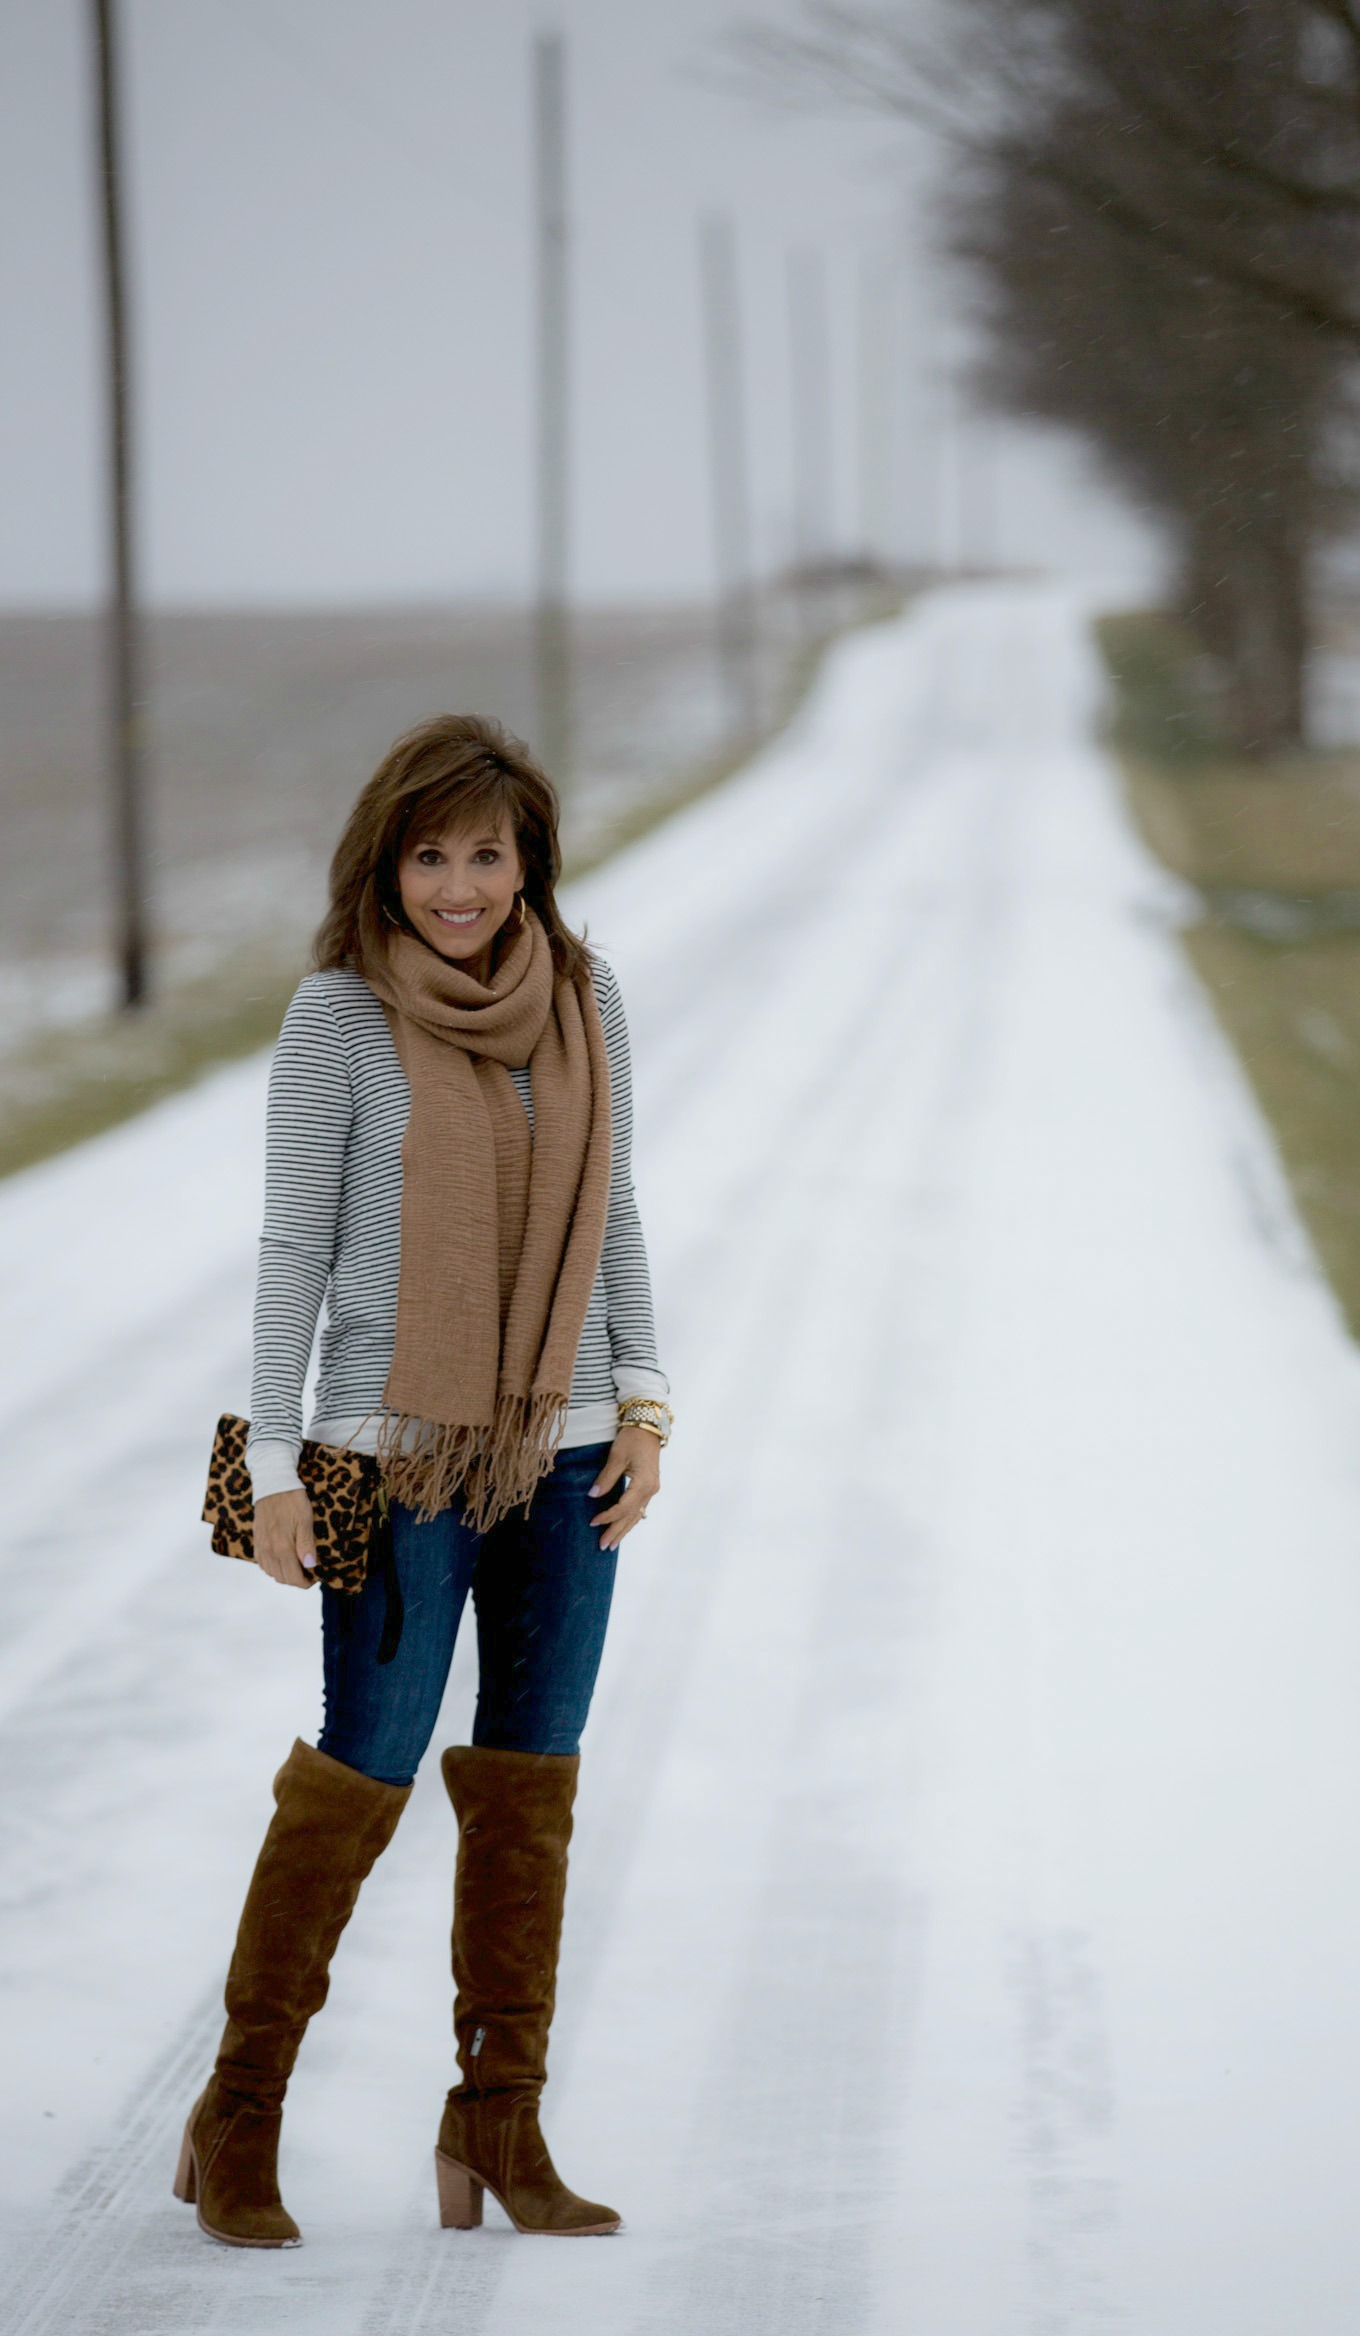 Fashion blogger, Cyndi Spivey, styling a striped top and fringe scarf.